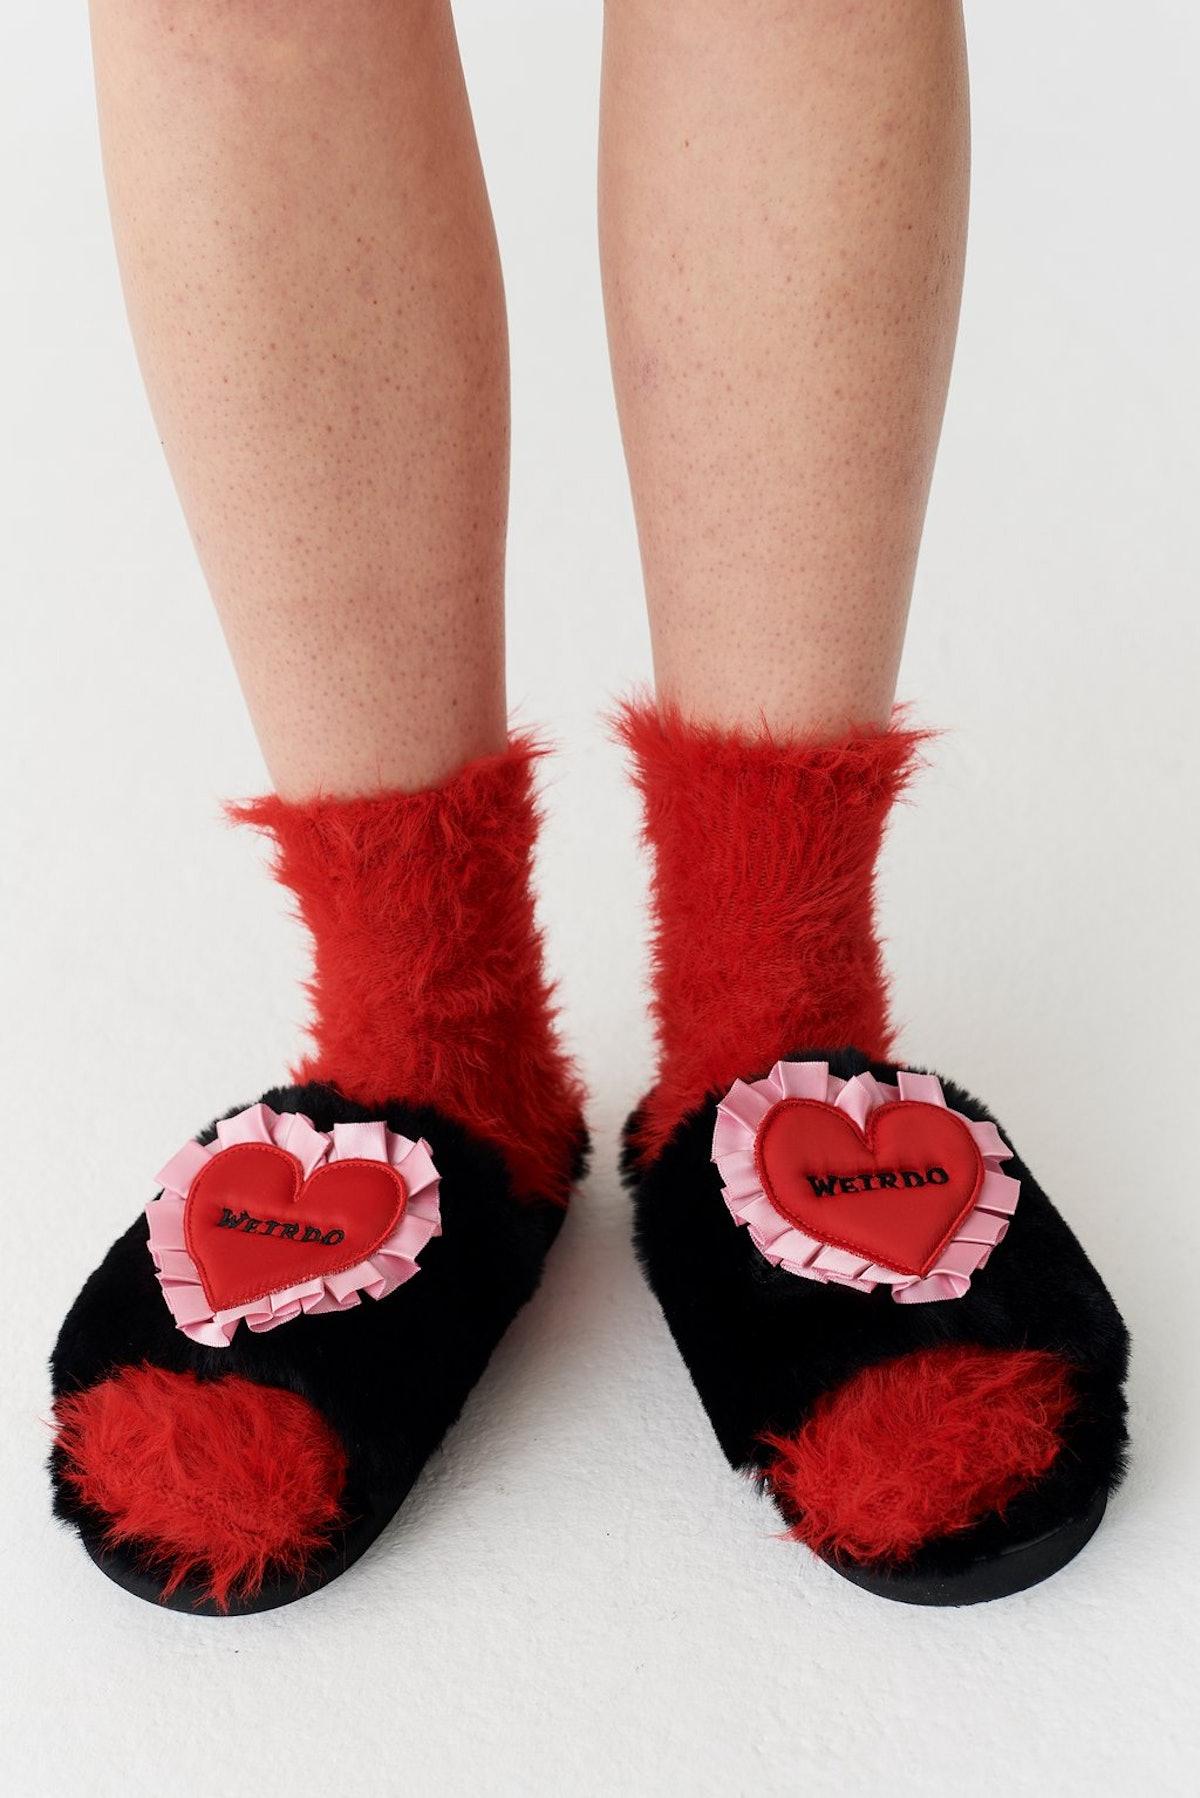 https://www.lazyoaf.com/products/lazy-oaf-wierdo-slippers